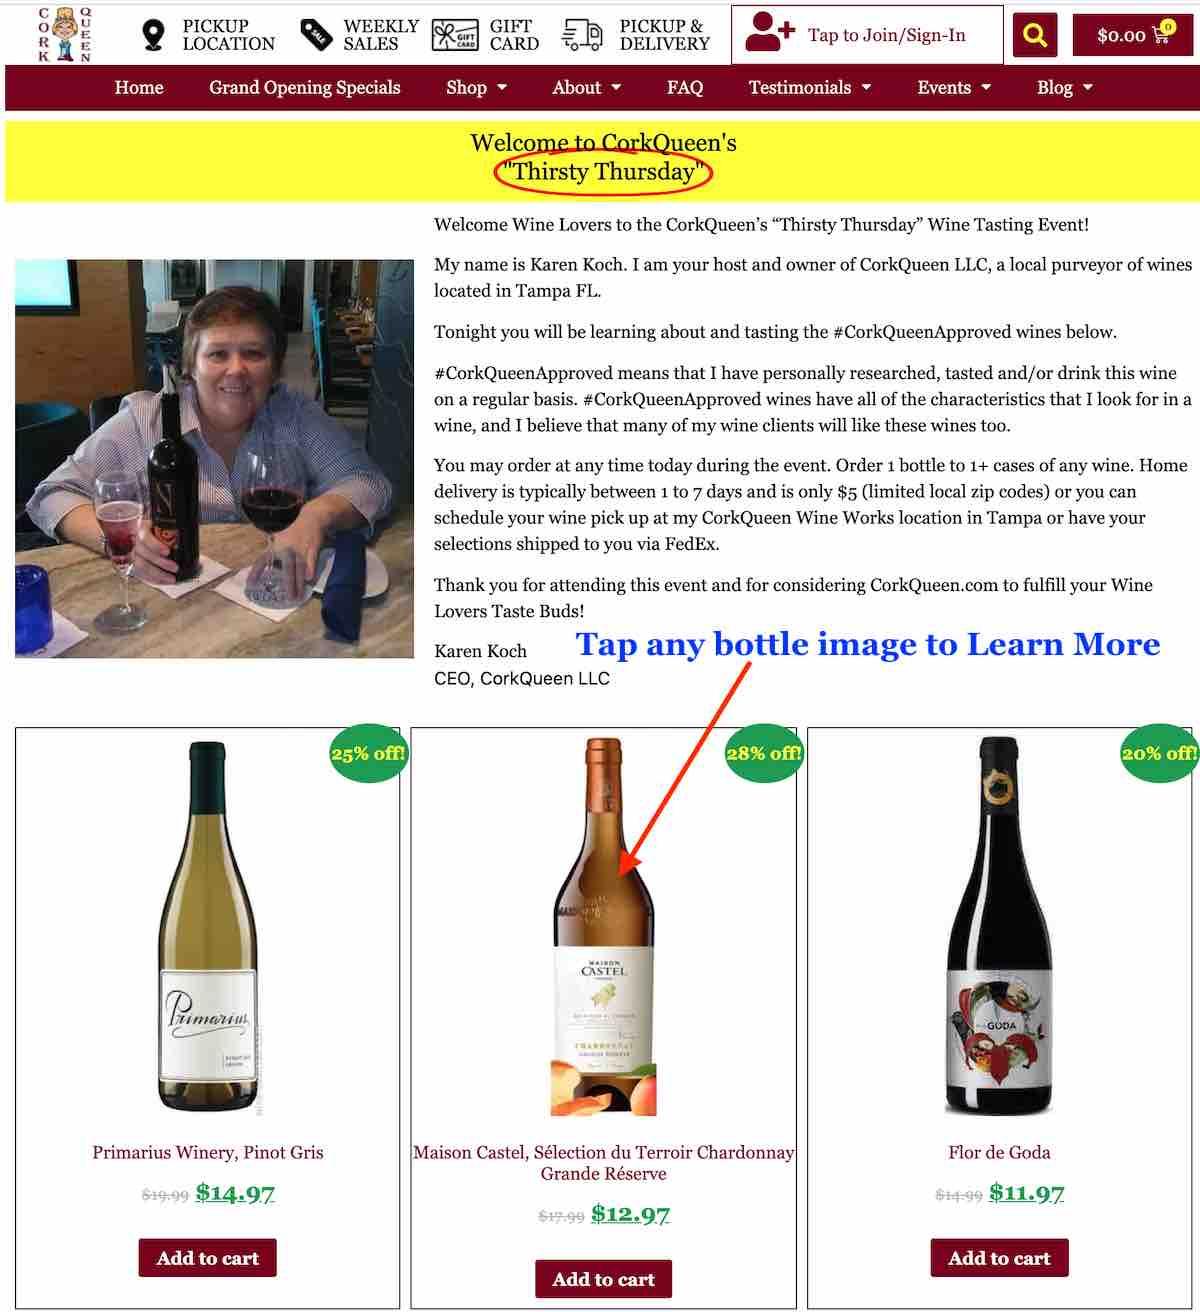 Order Wine - Step 2a